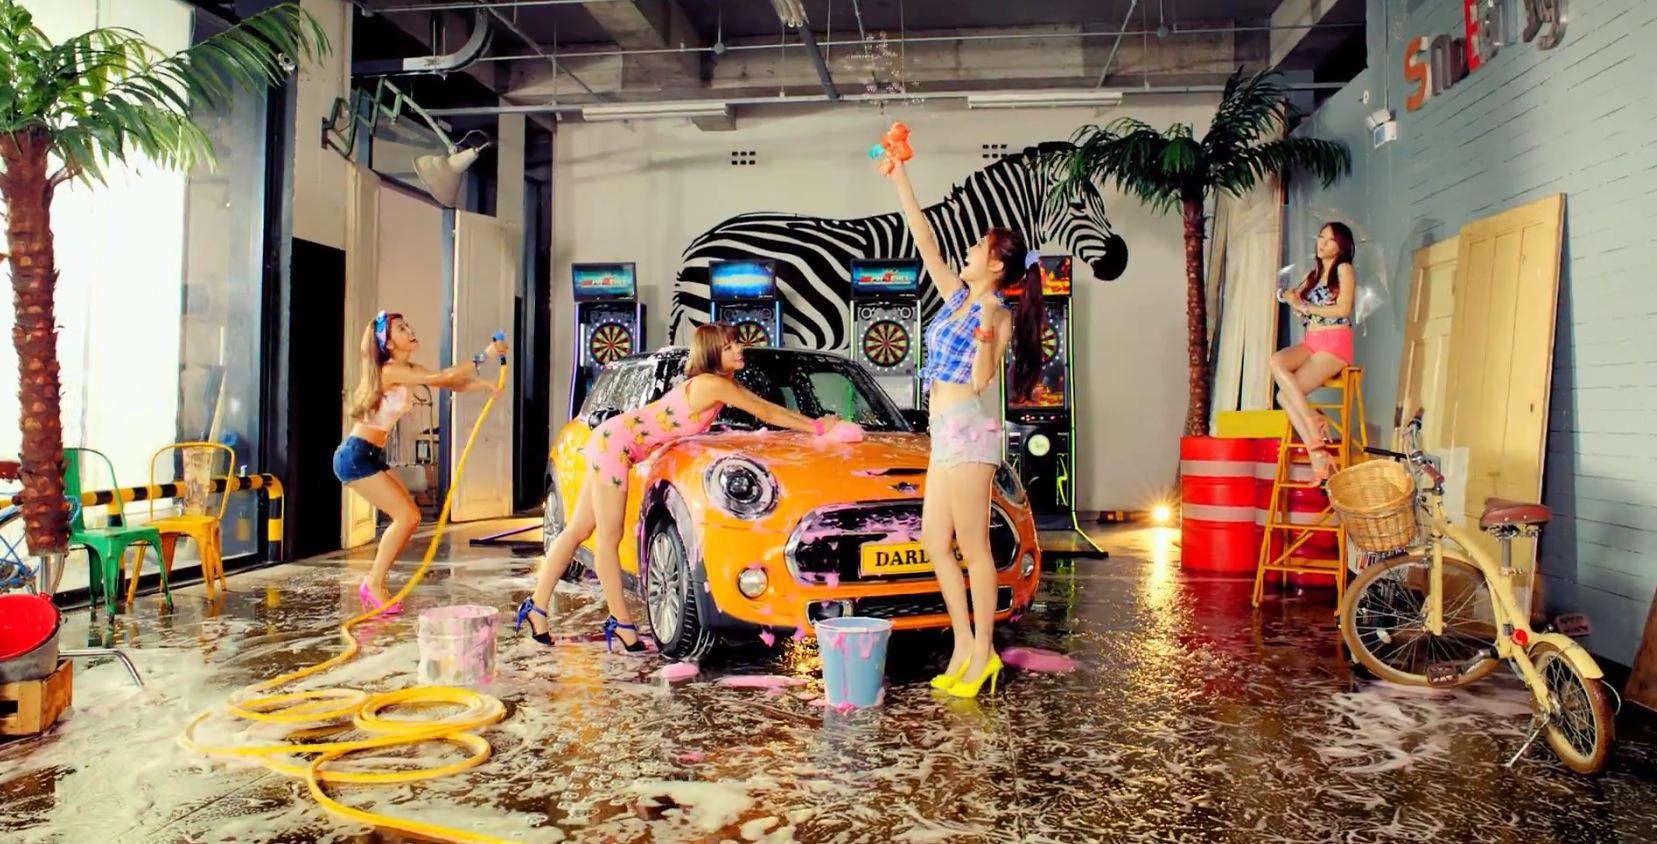 Hot summer four girls one guys 21 verano 2015 part 2 - 2 part 4